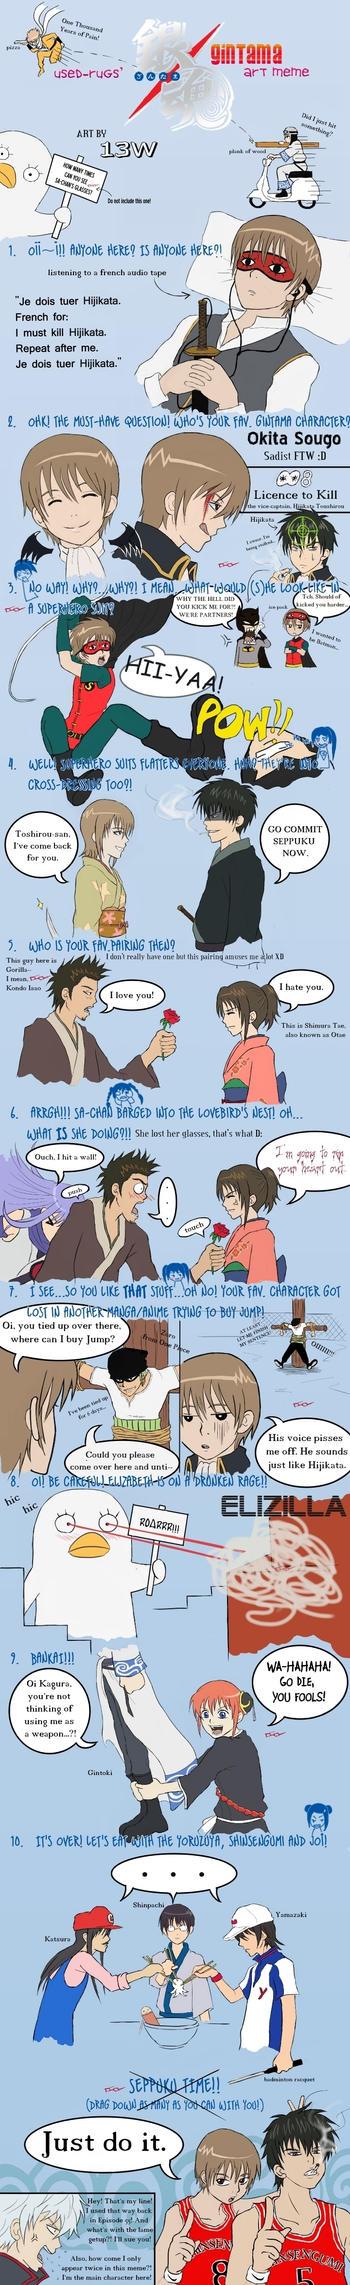 Gintama Art Meme no.1 by 13W